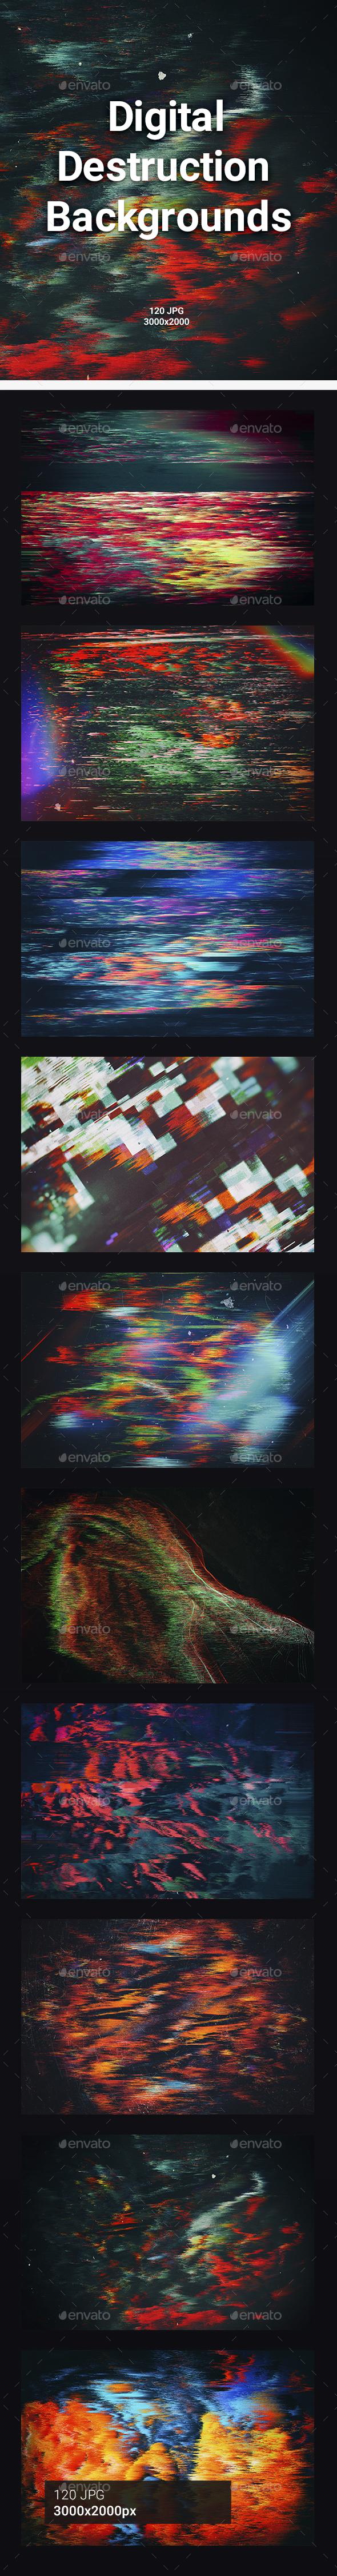 Digital Destruction Backgrounds - Abstract Backgrounds